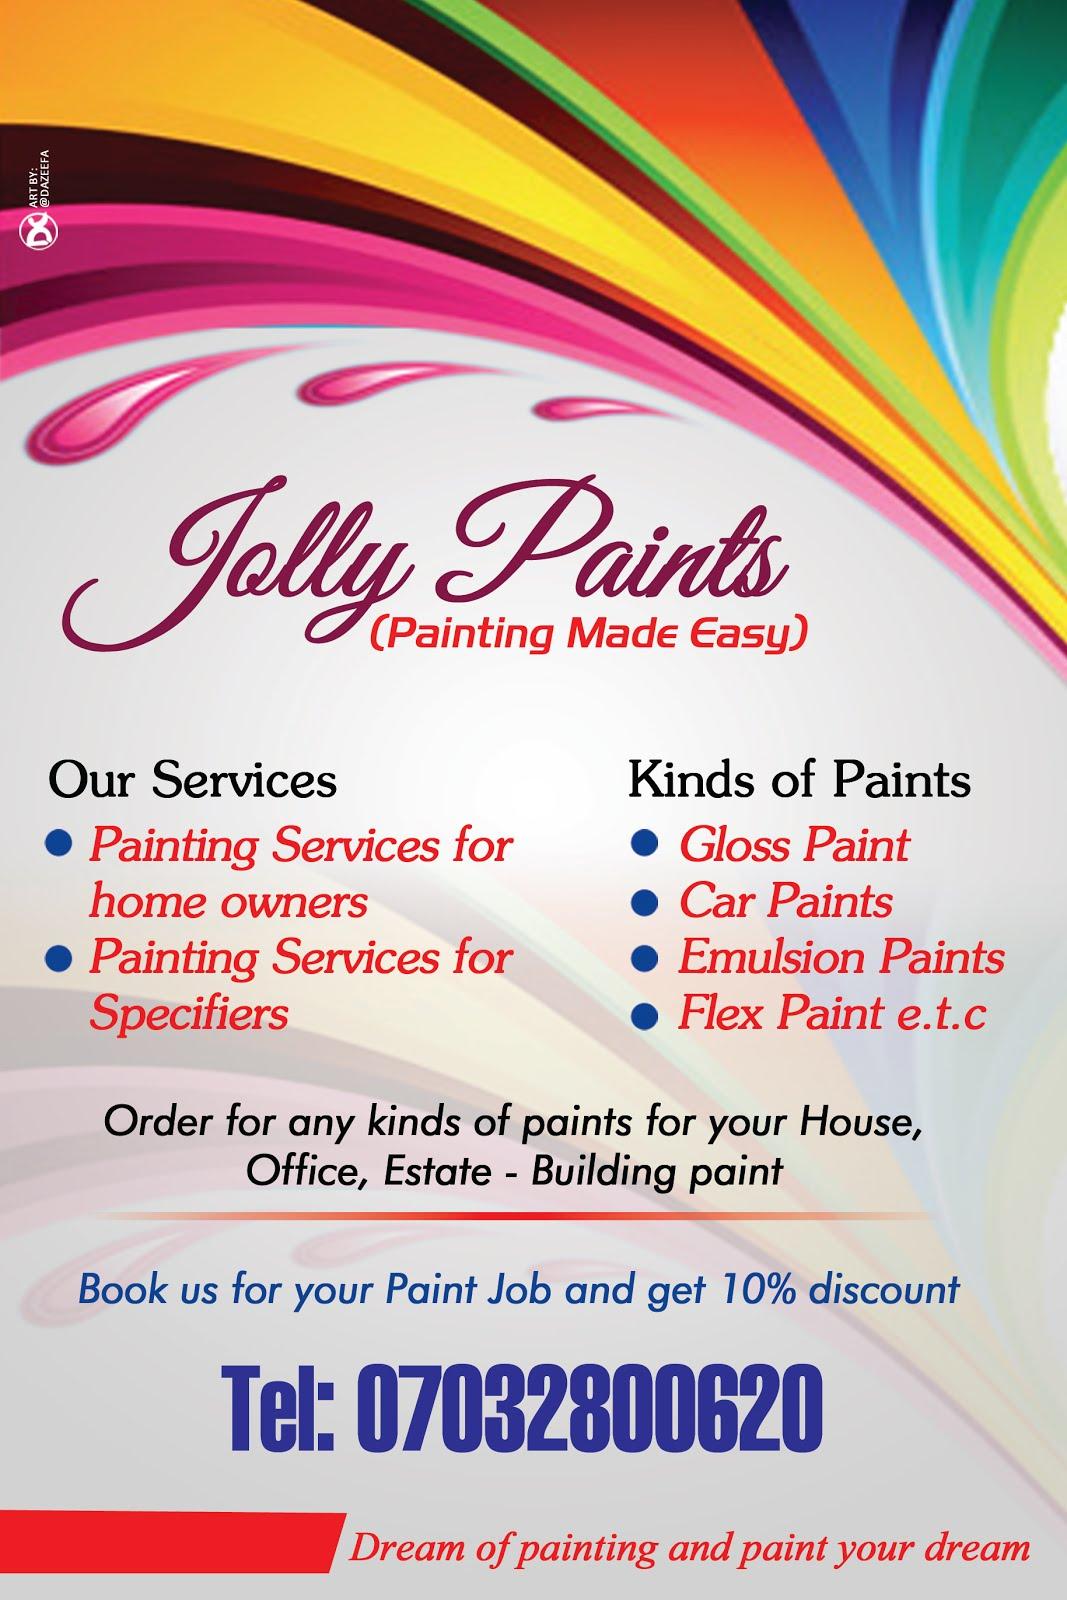 Jolly Paints